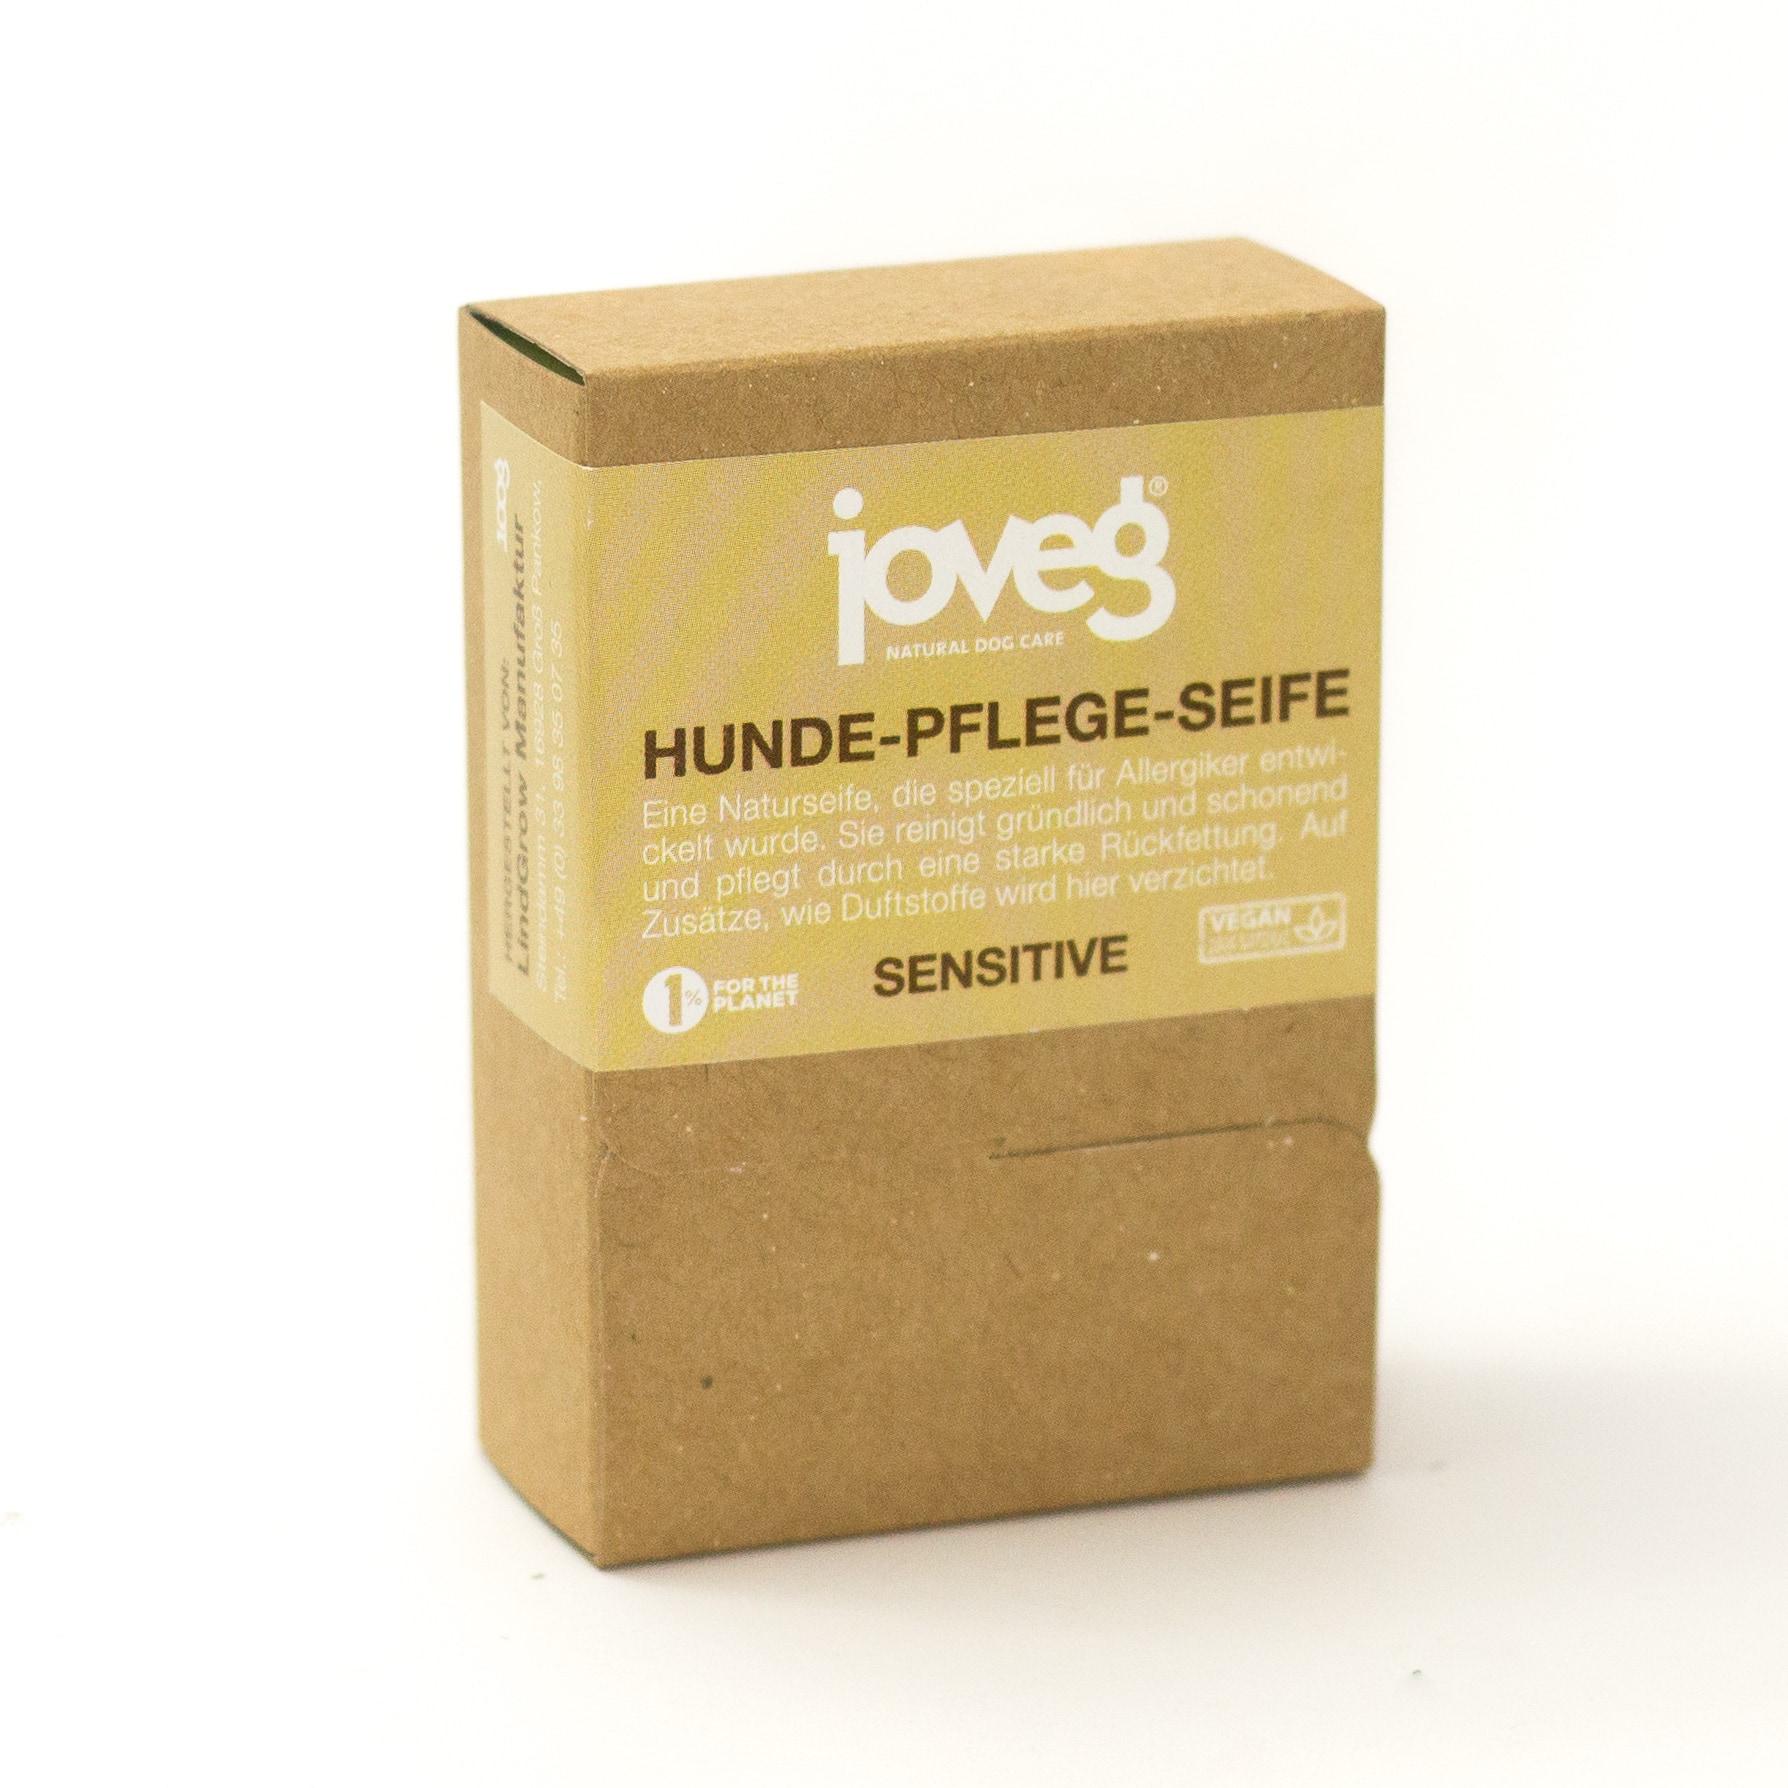 "joveg Hunde-Pflege-Seife ""SENSITIVE"" 100 g"